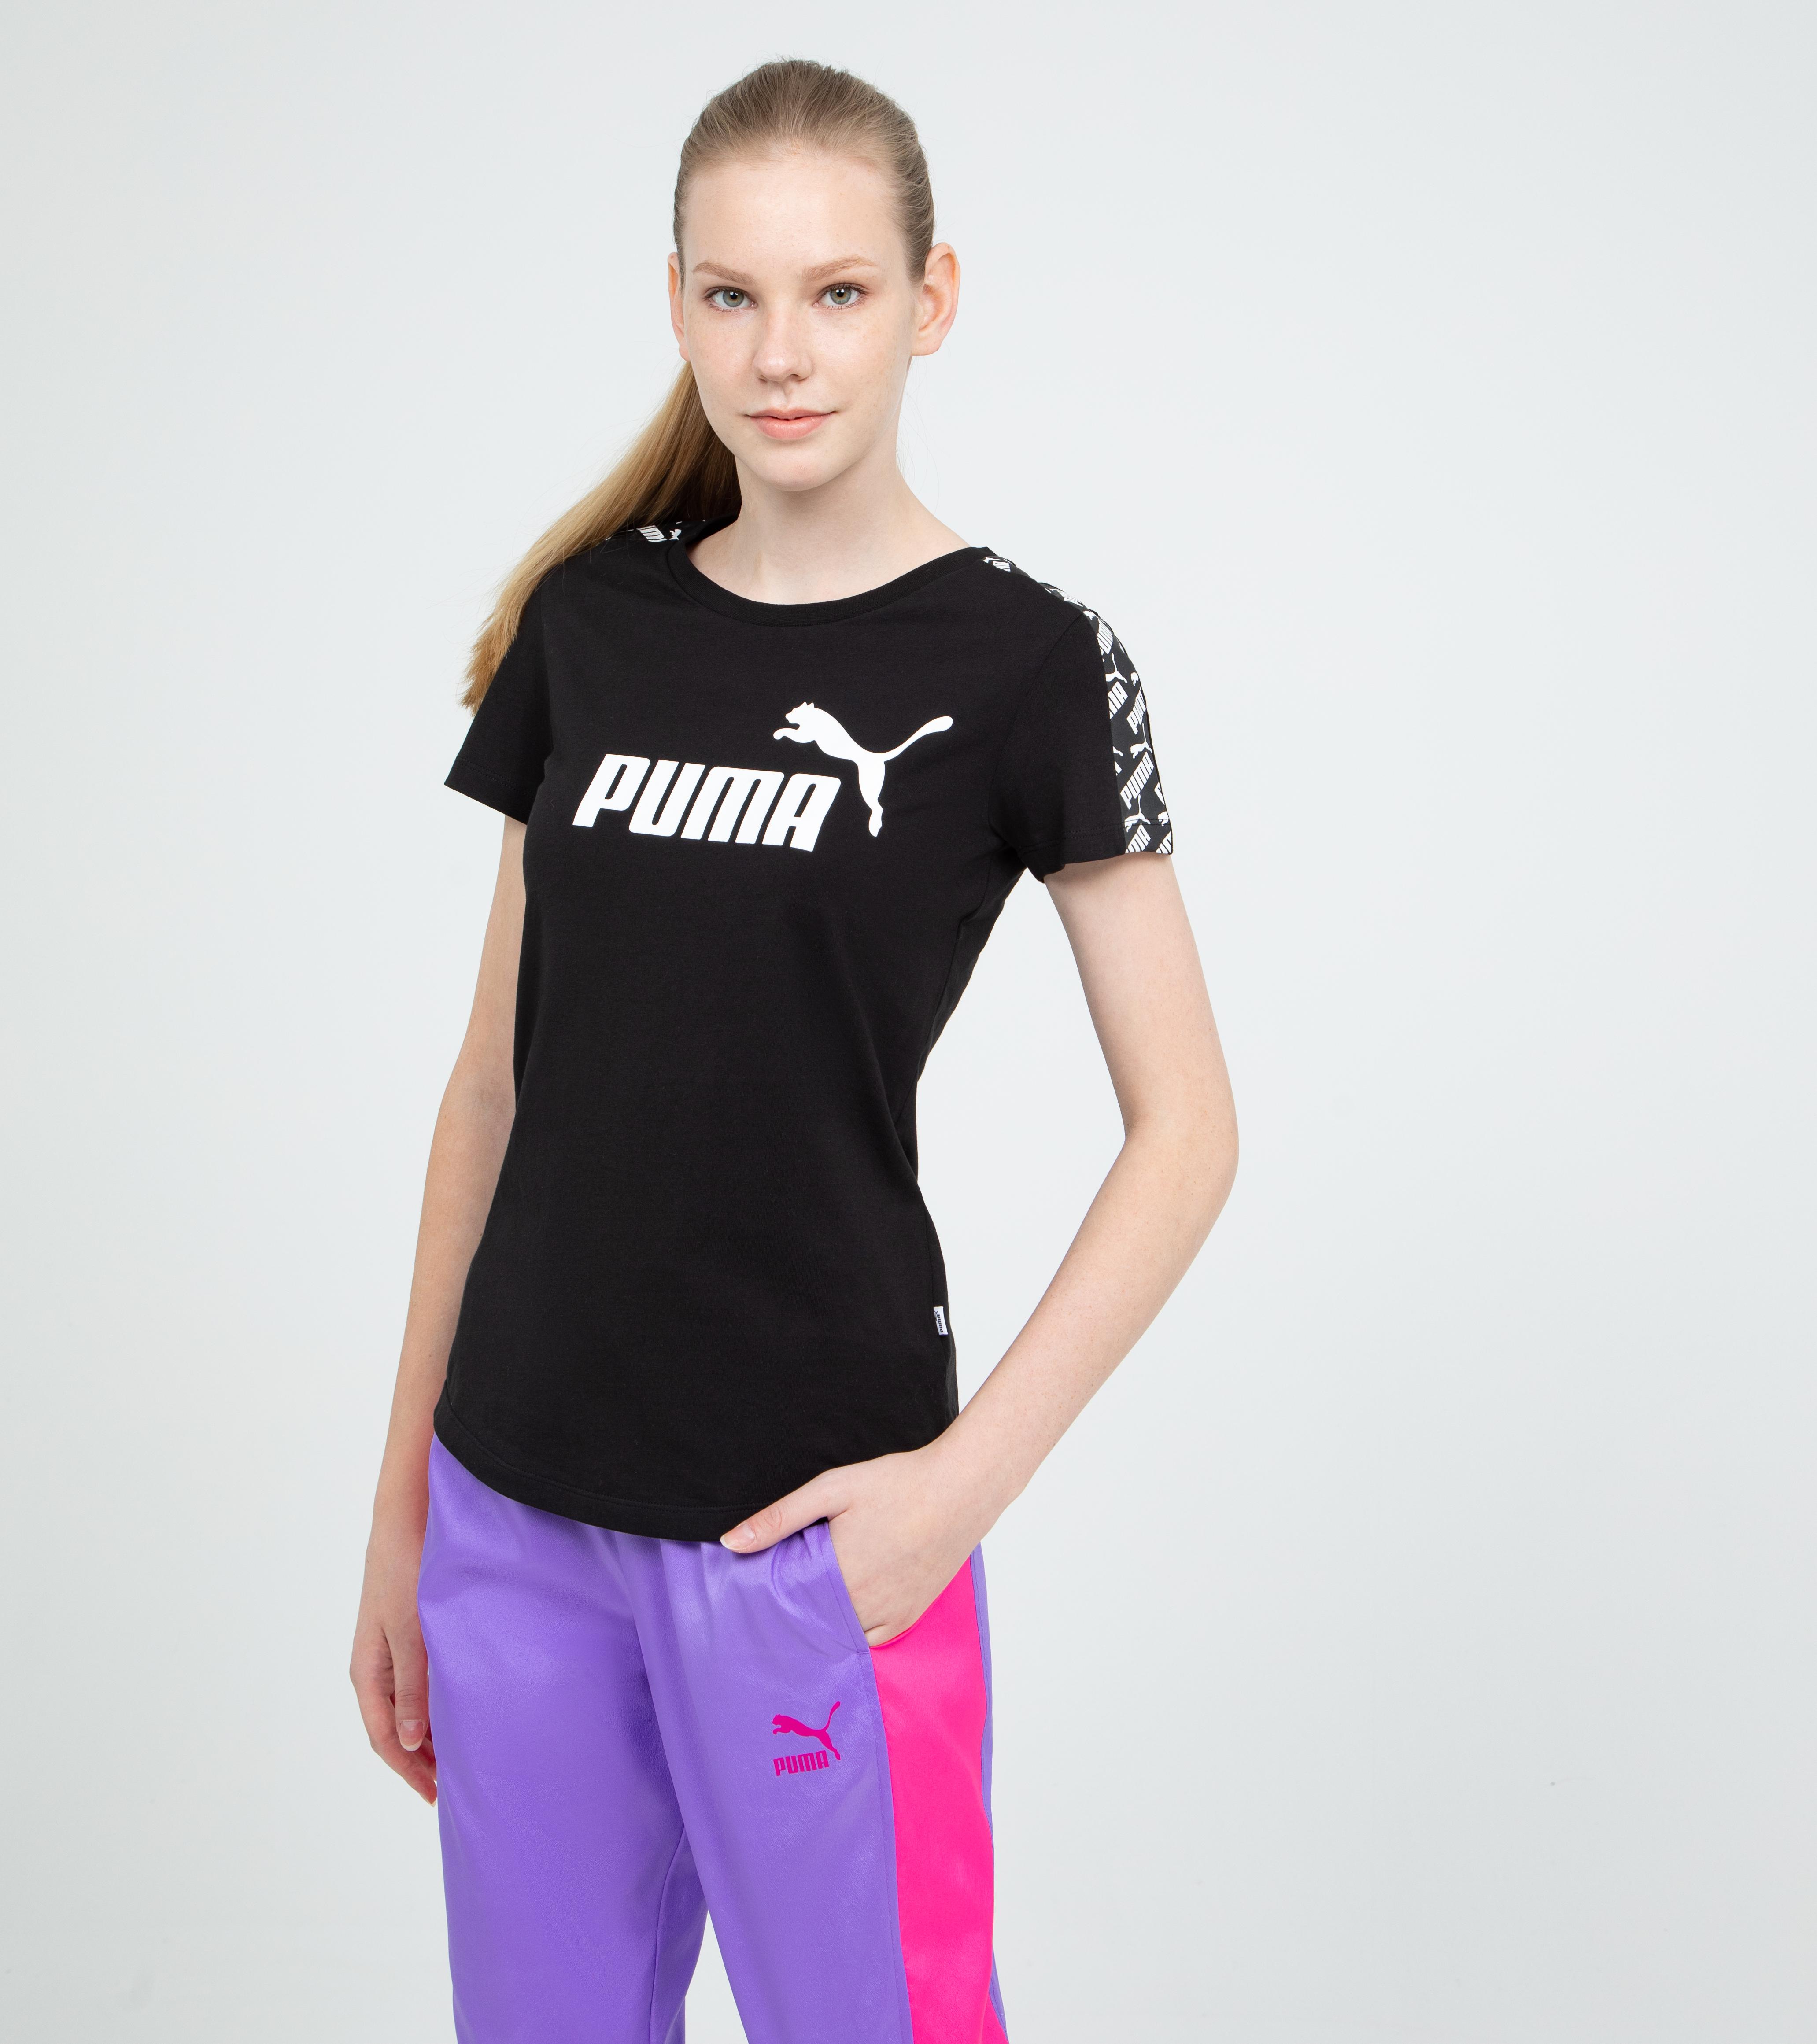 PUMA Футболка женская Puma Amplified Tee, размер 44-46